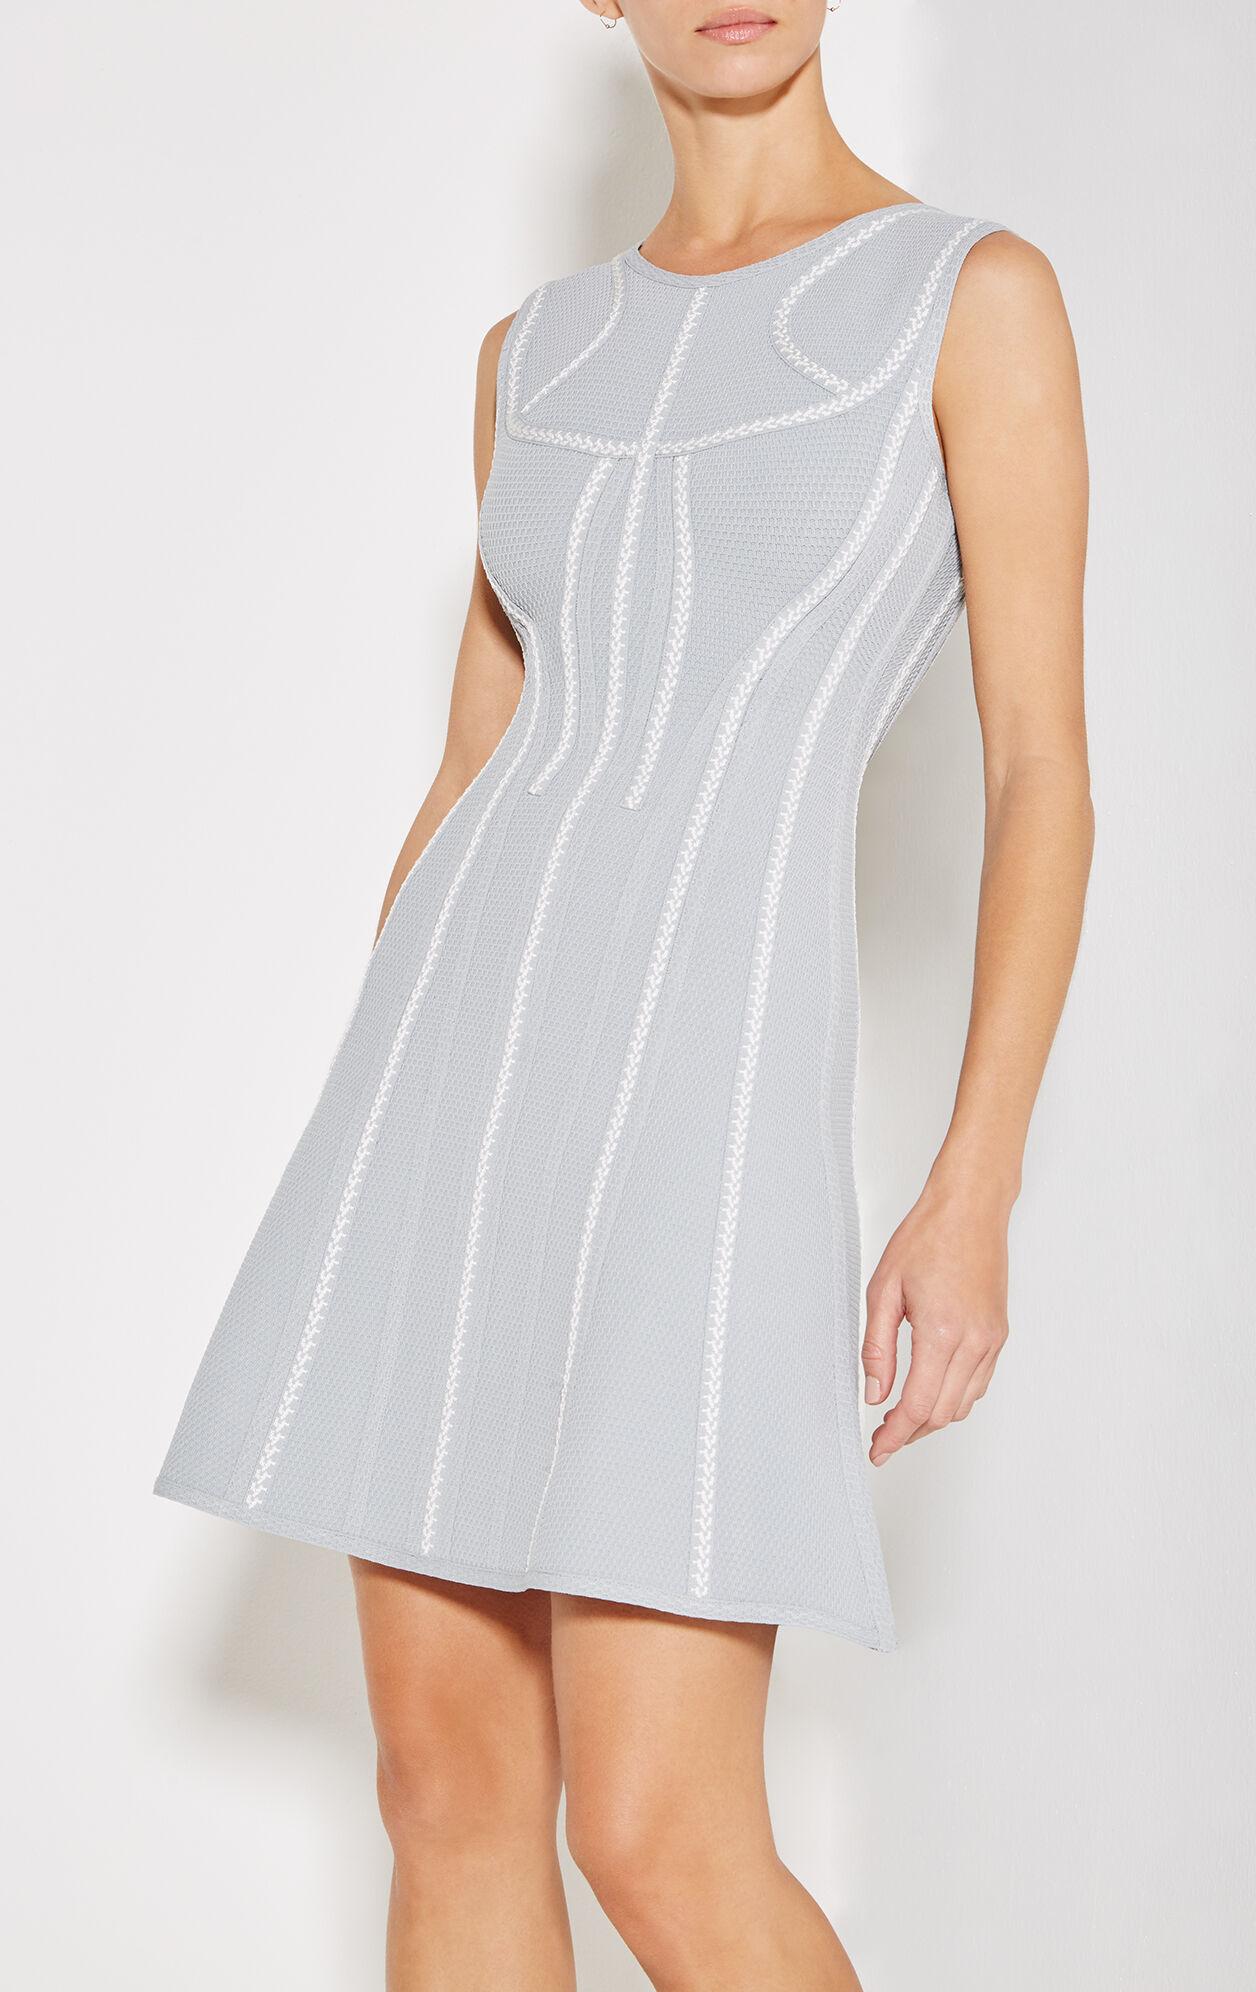 Liany Texture Bandage Flare Dress